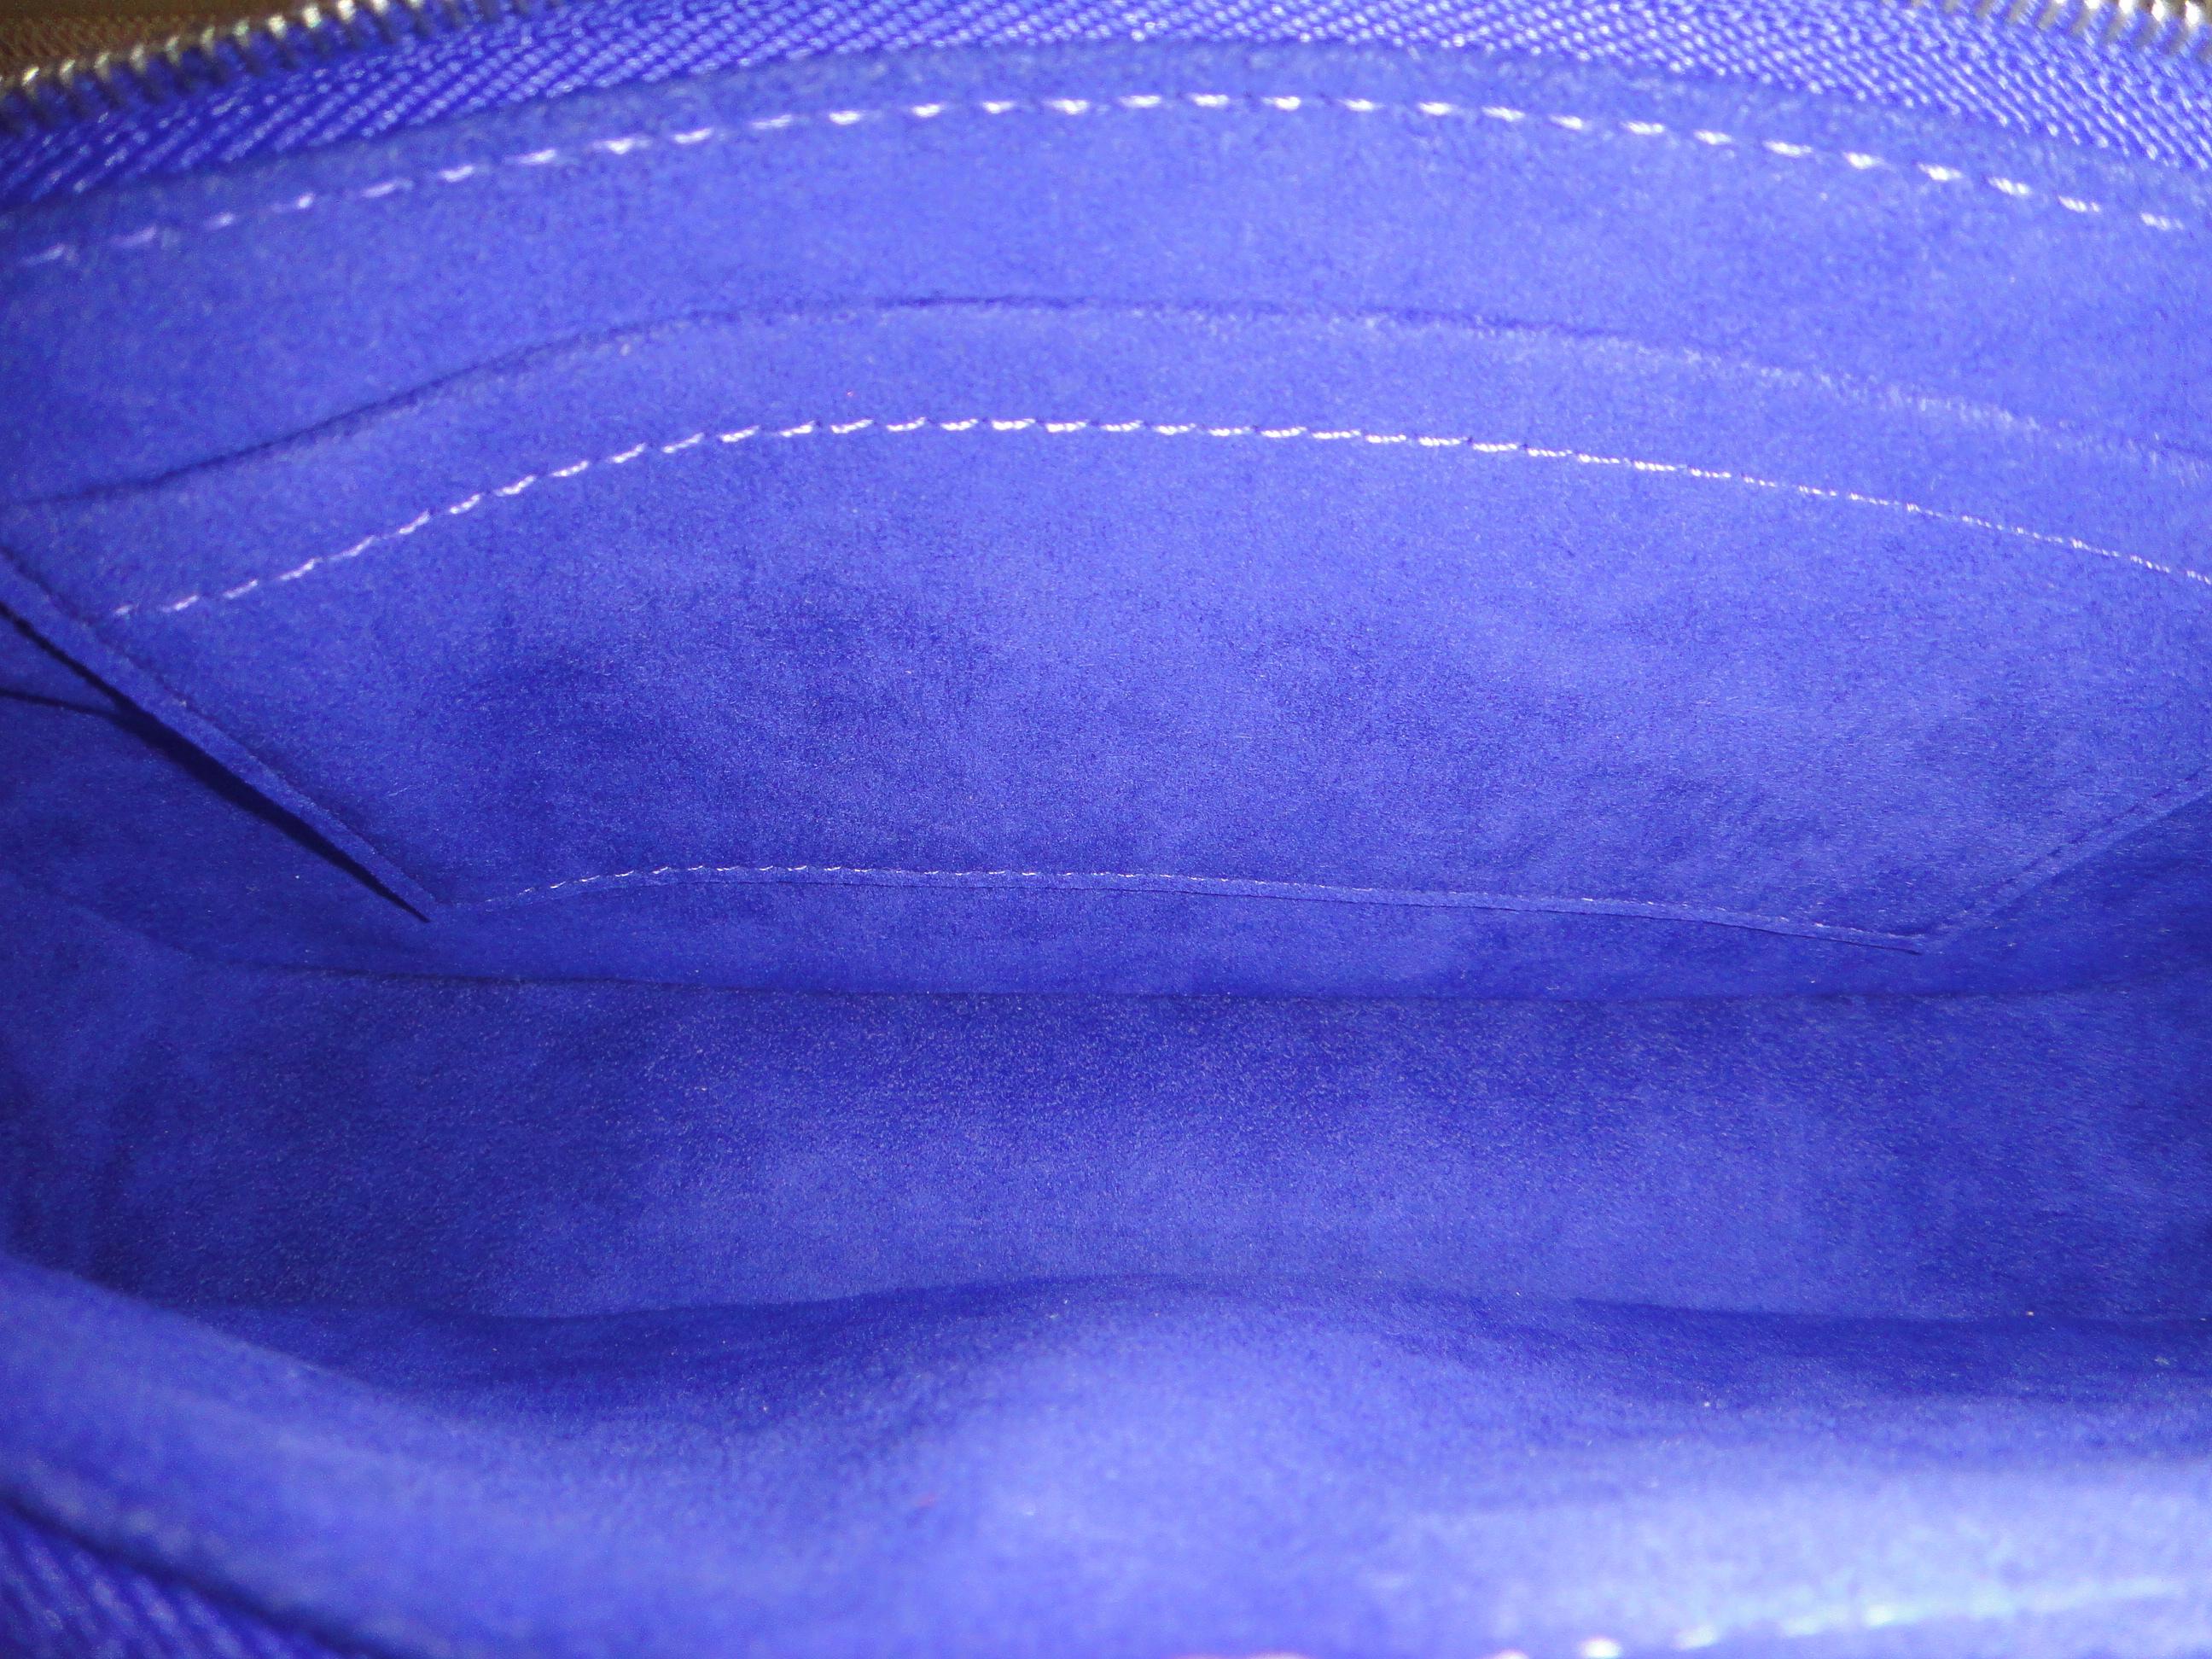 inside of new LV Epi Pochette Accessoires - FIGUE